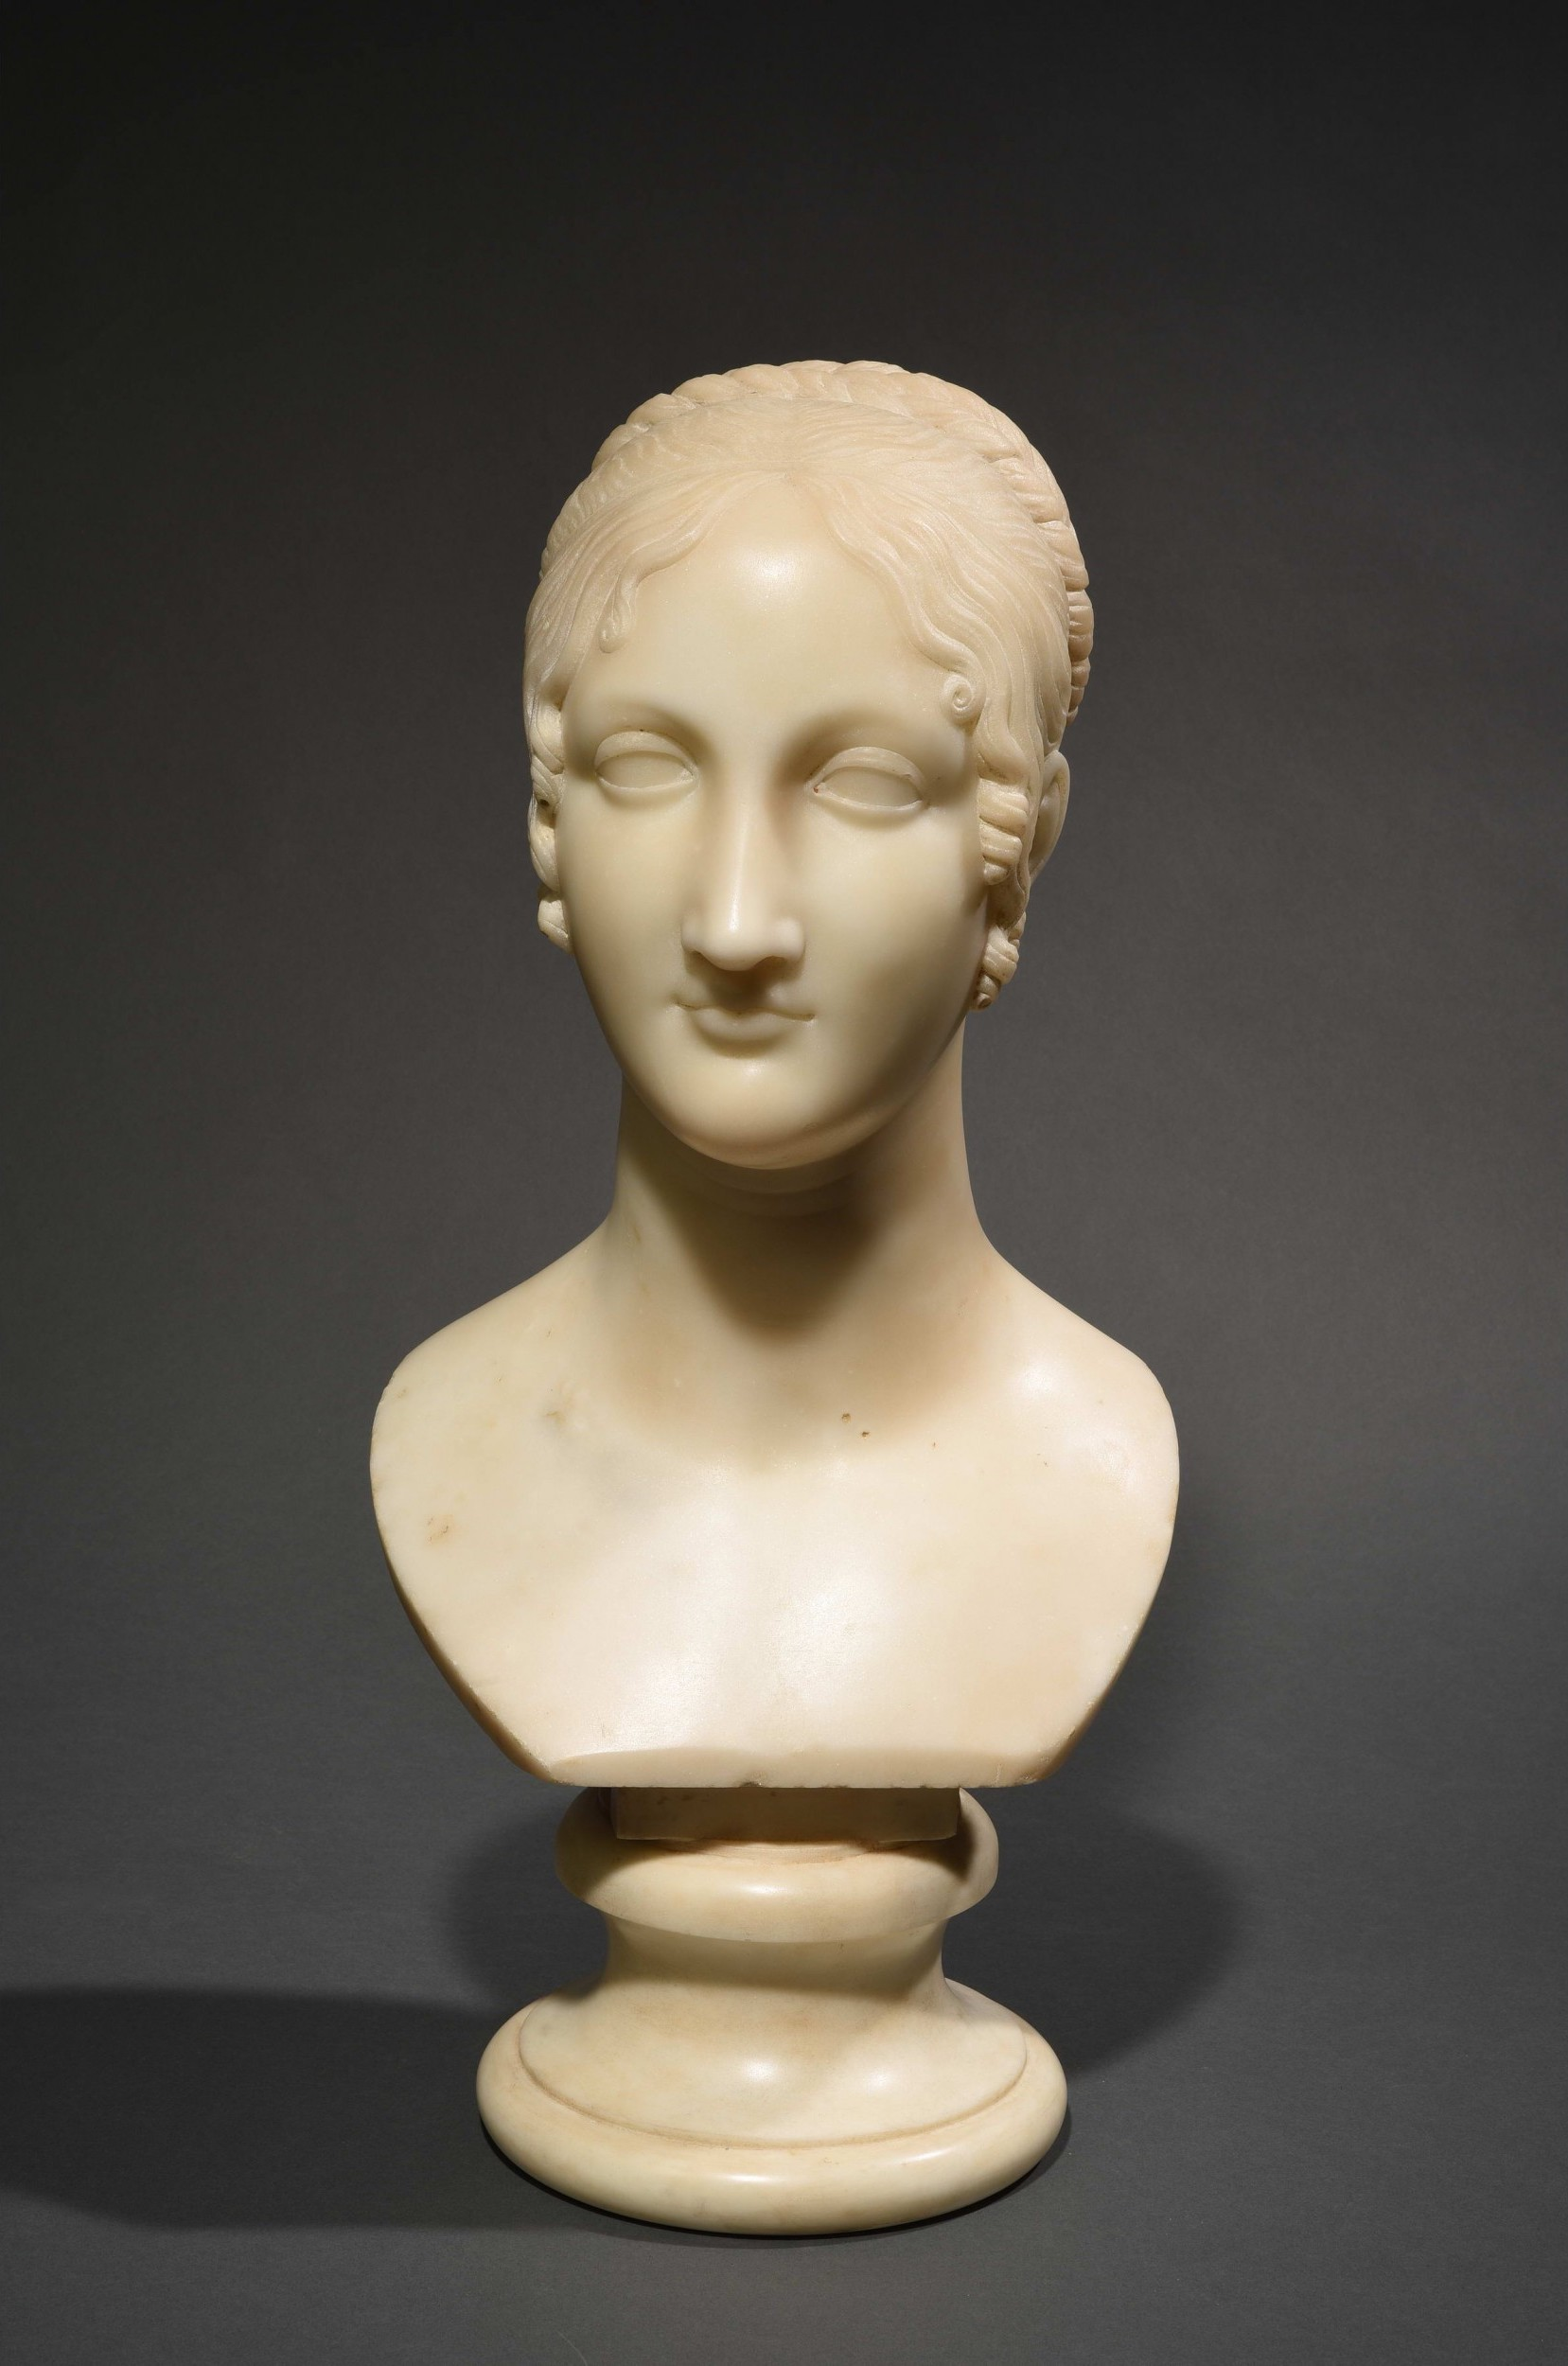 Antonio Canova, 'Lucrezia D'Este', 1821-22. Photo: © HVMC